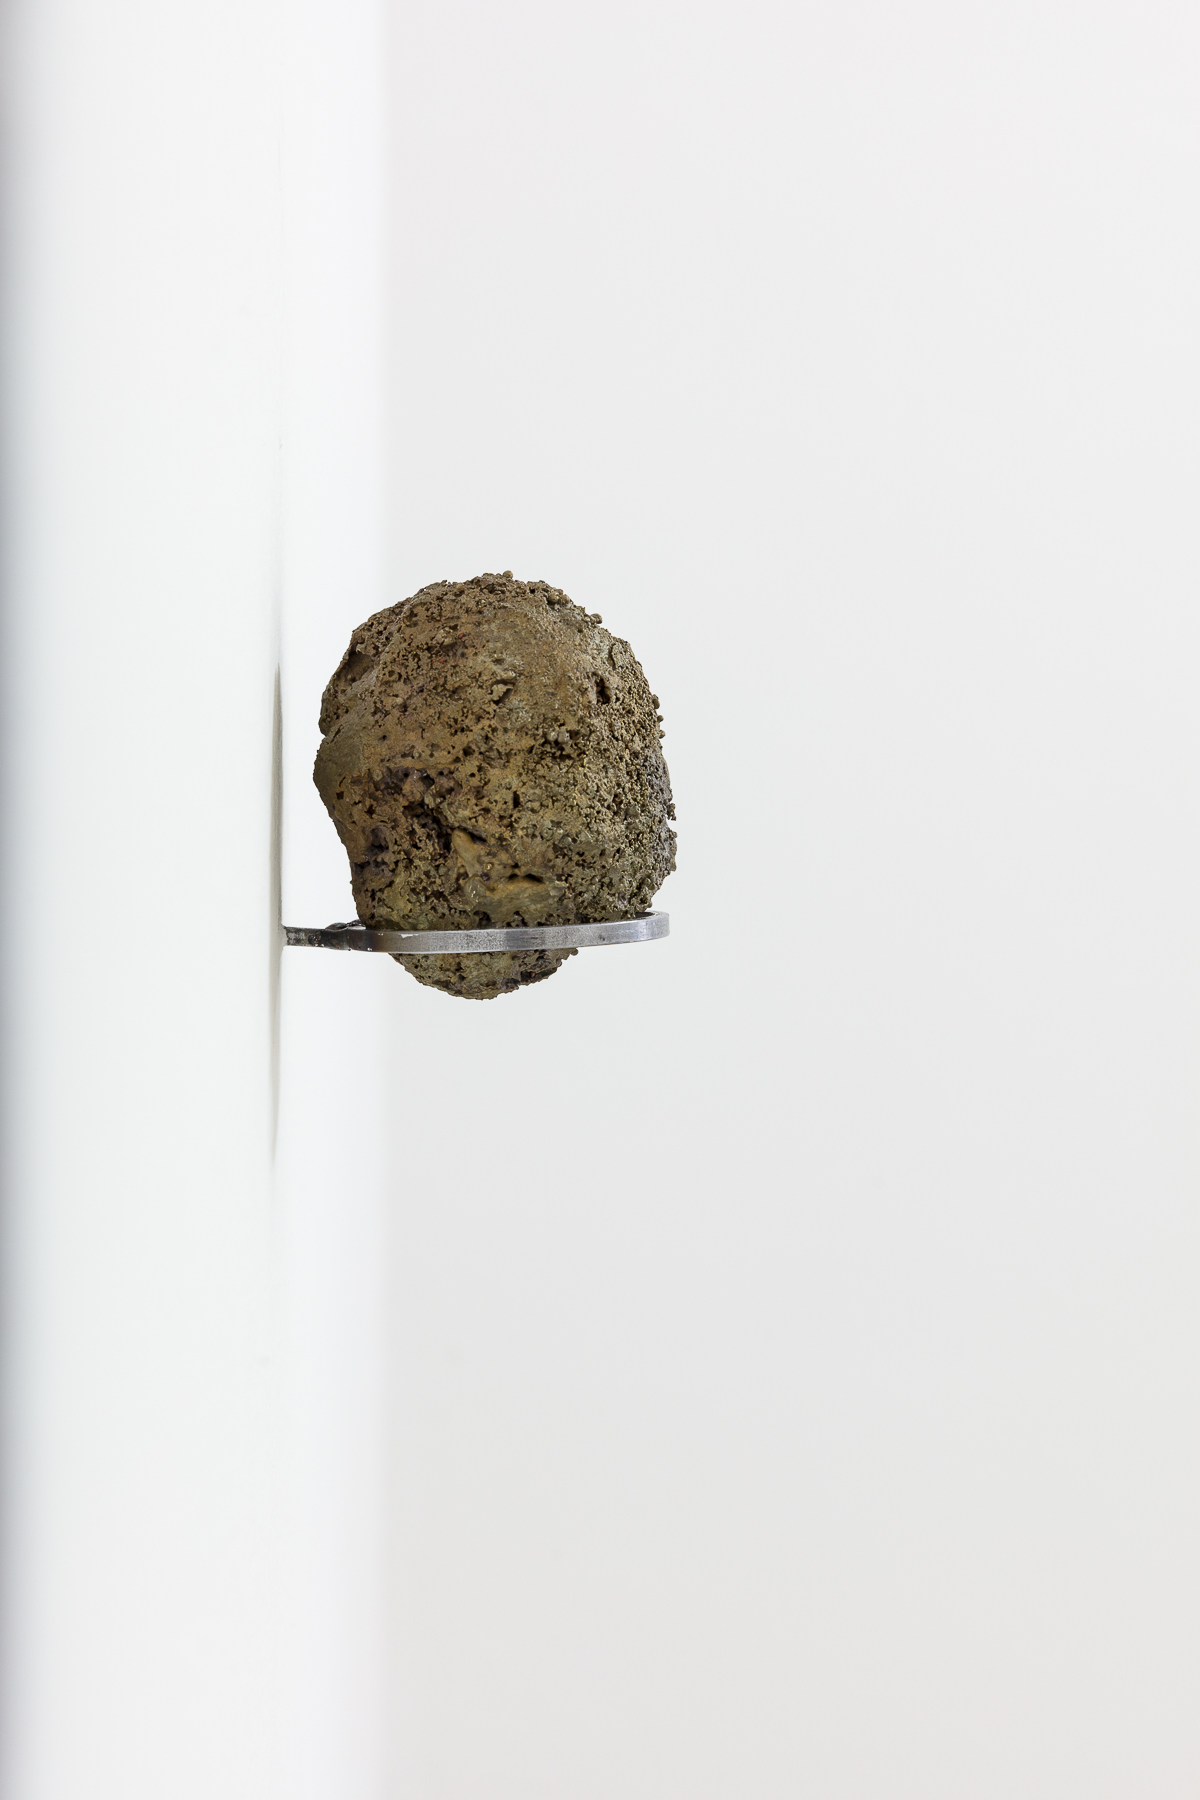 2019_02_19_Angelika Loderer_Kunstverein Graz_by_kunstdokumentationcom_016_web.jpg